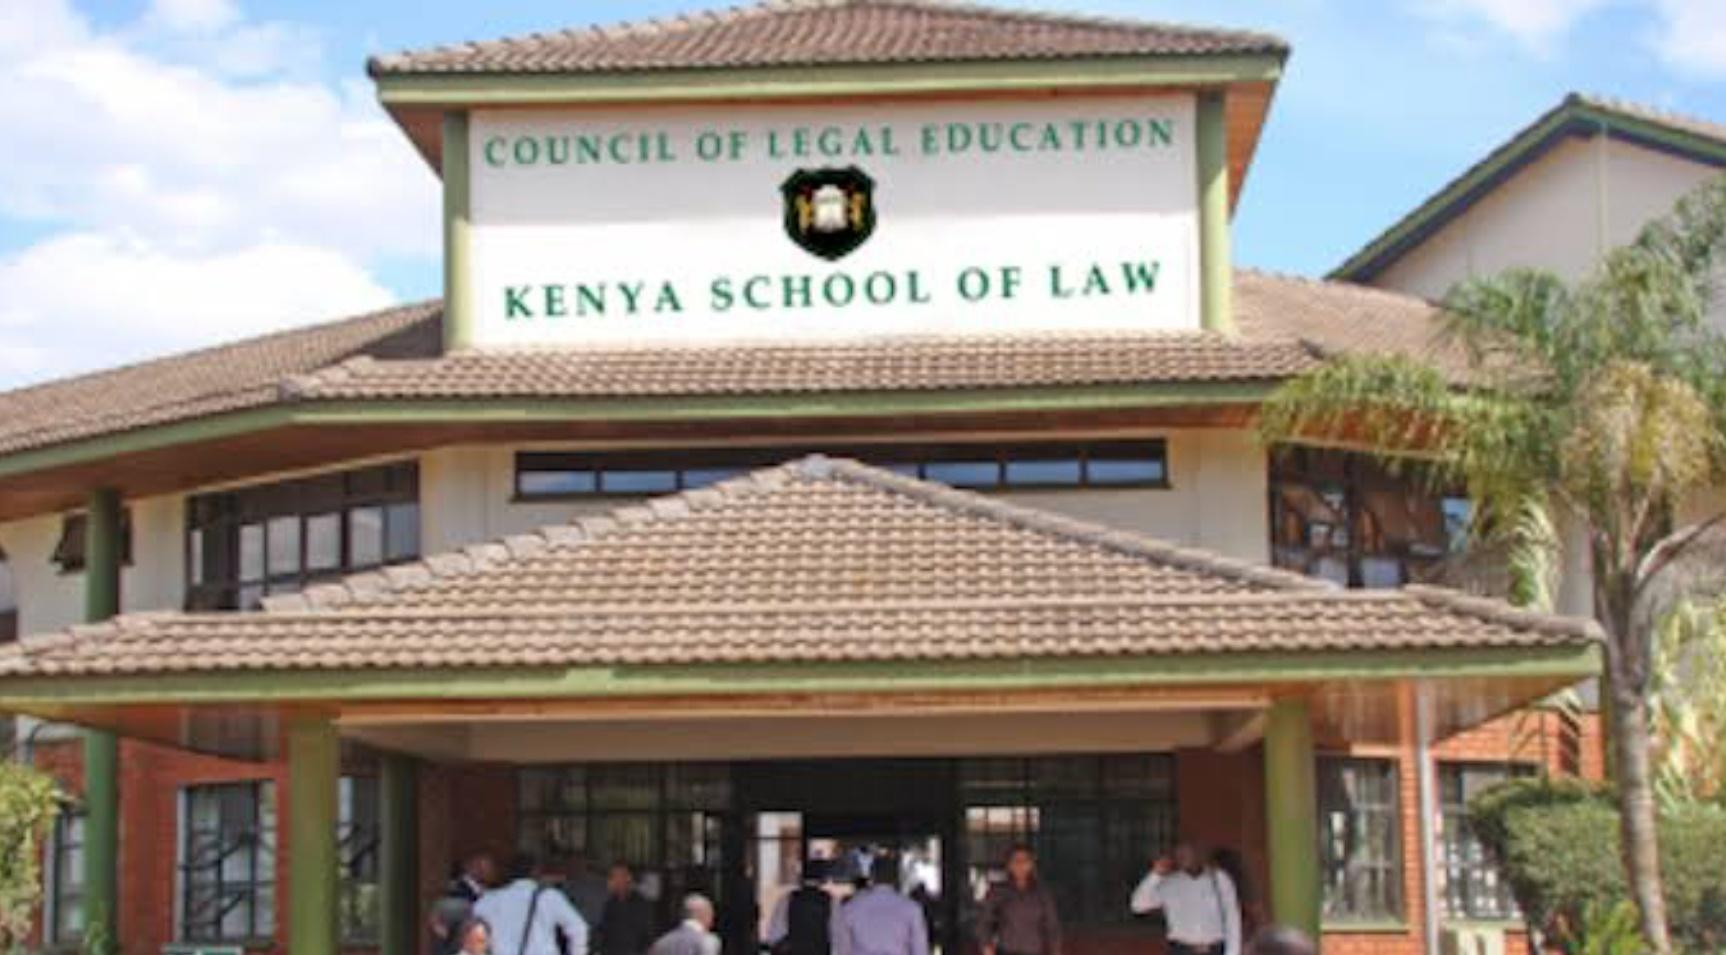 Kenya School of Law On Spot As 12 Staff Members Arrested For Fraud